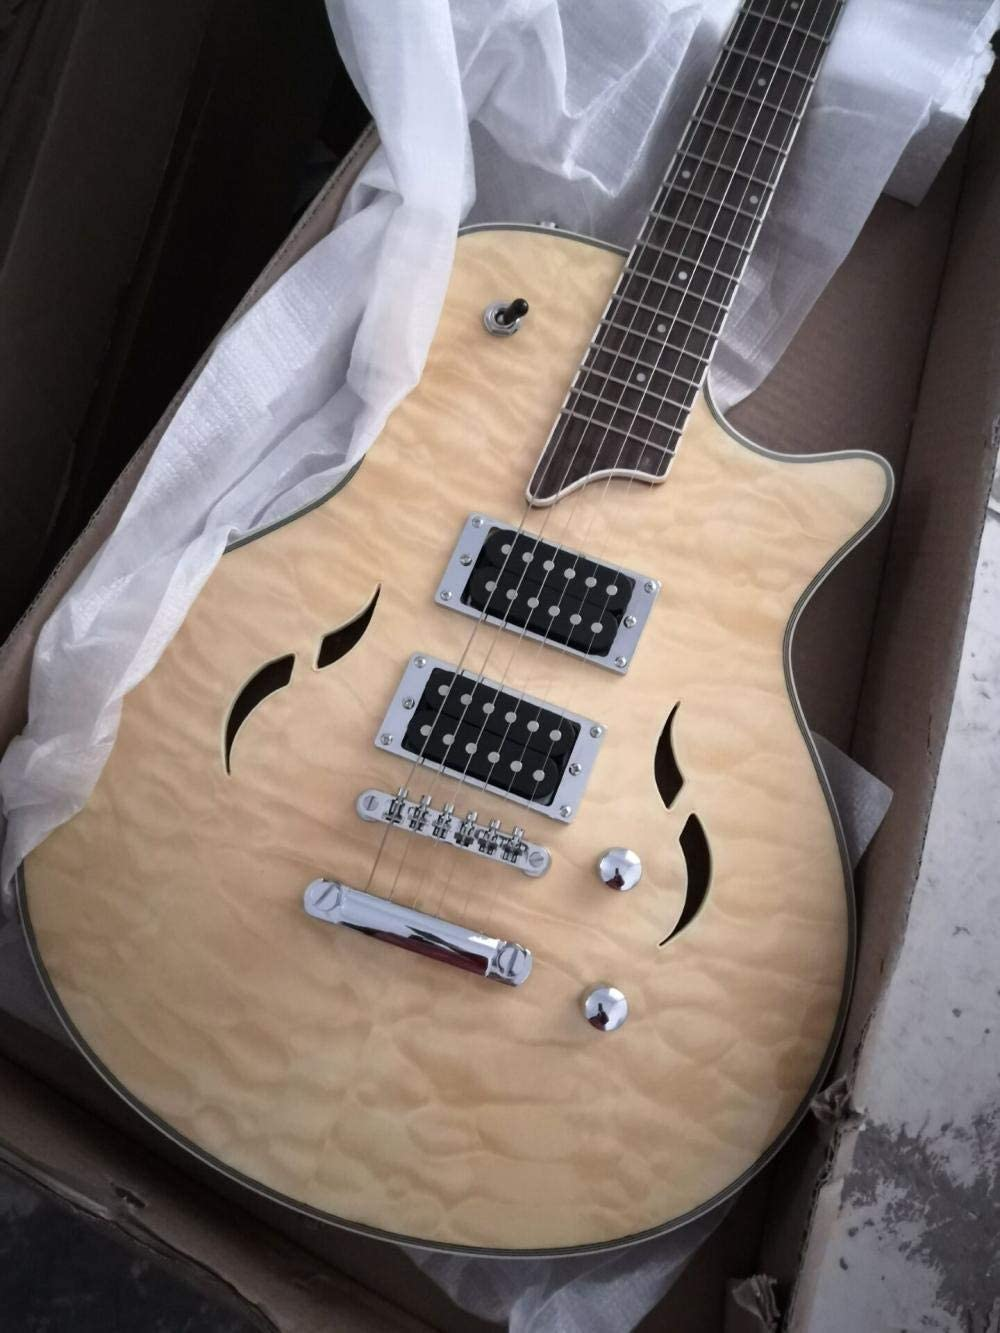 LYNLYN Guitarras Guitarra Eléctrica Arce Forrada Semi Hueca Guitarra 6 Cuerdas Guitarra Eléctrica Acústica Acústica Cuerda Guitarras Guitarra eléctrica